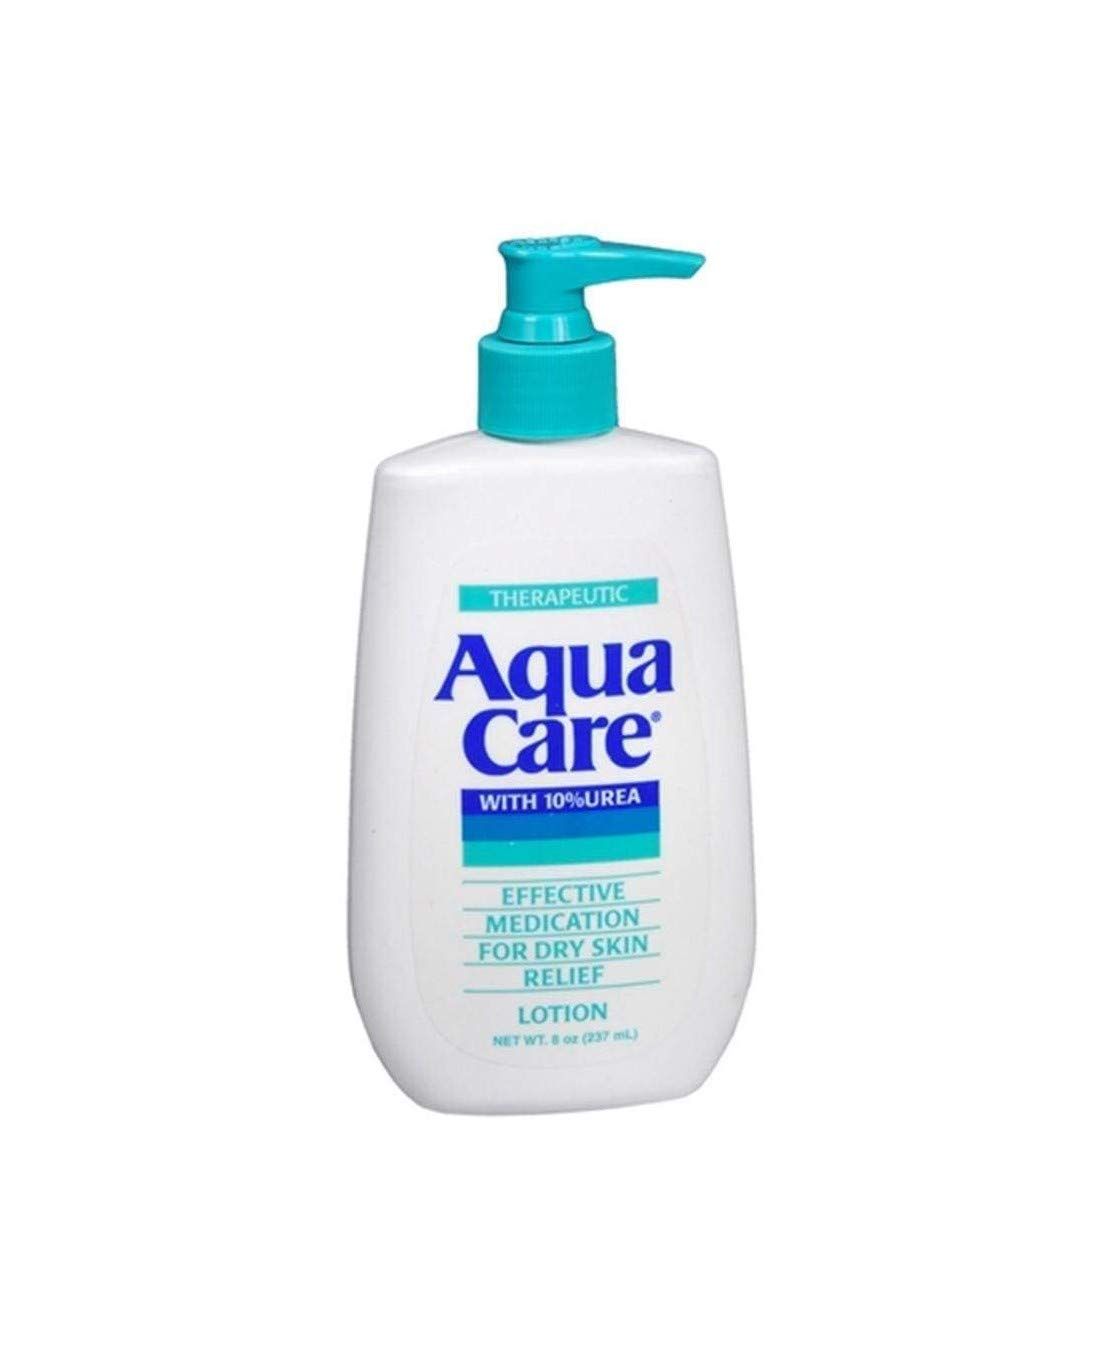 Aqua Care Lotion for Dry Skin, with 10 Percent Urea - 8 fl oz